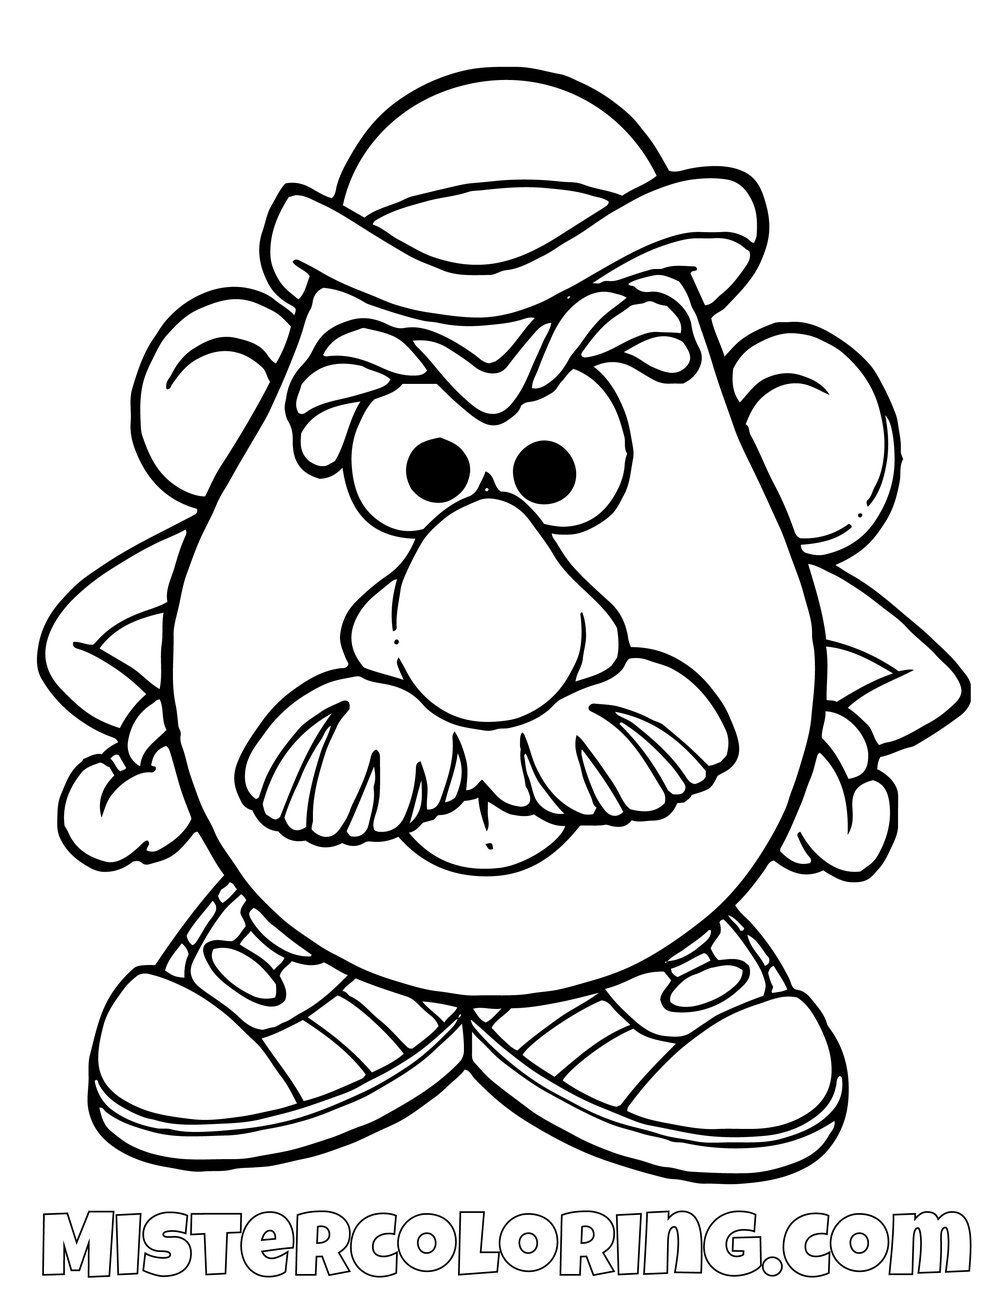 Potato Coloring Page Printable Head Pages Chip Bag To Print Plant Colouring Toy Story Para Colorear Dibujos Para Pintar Faciles Tutorial De Pulseras De Amistad